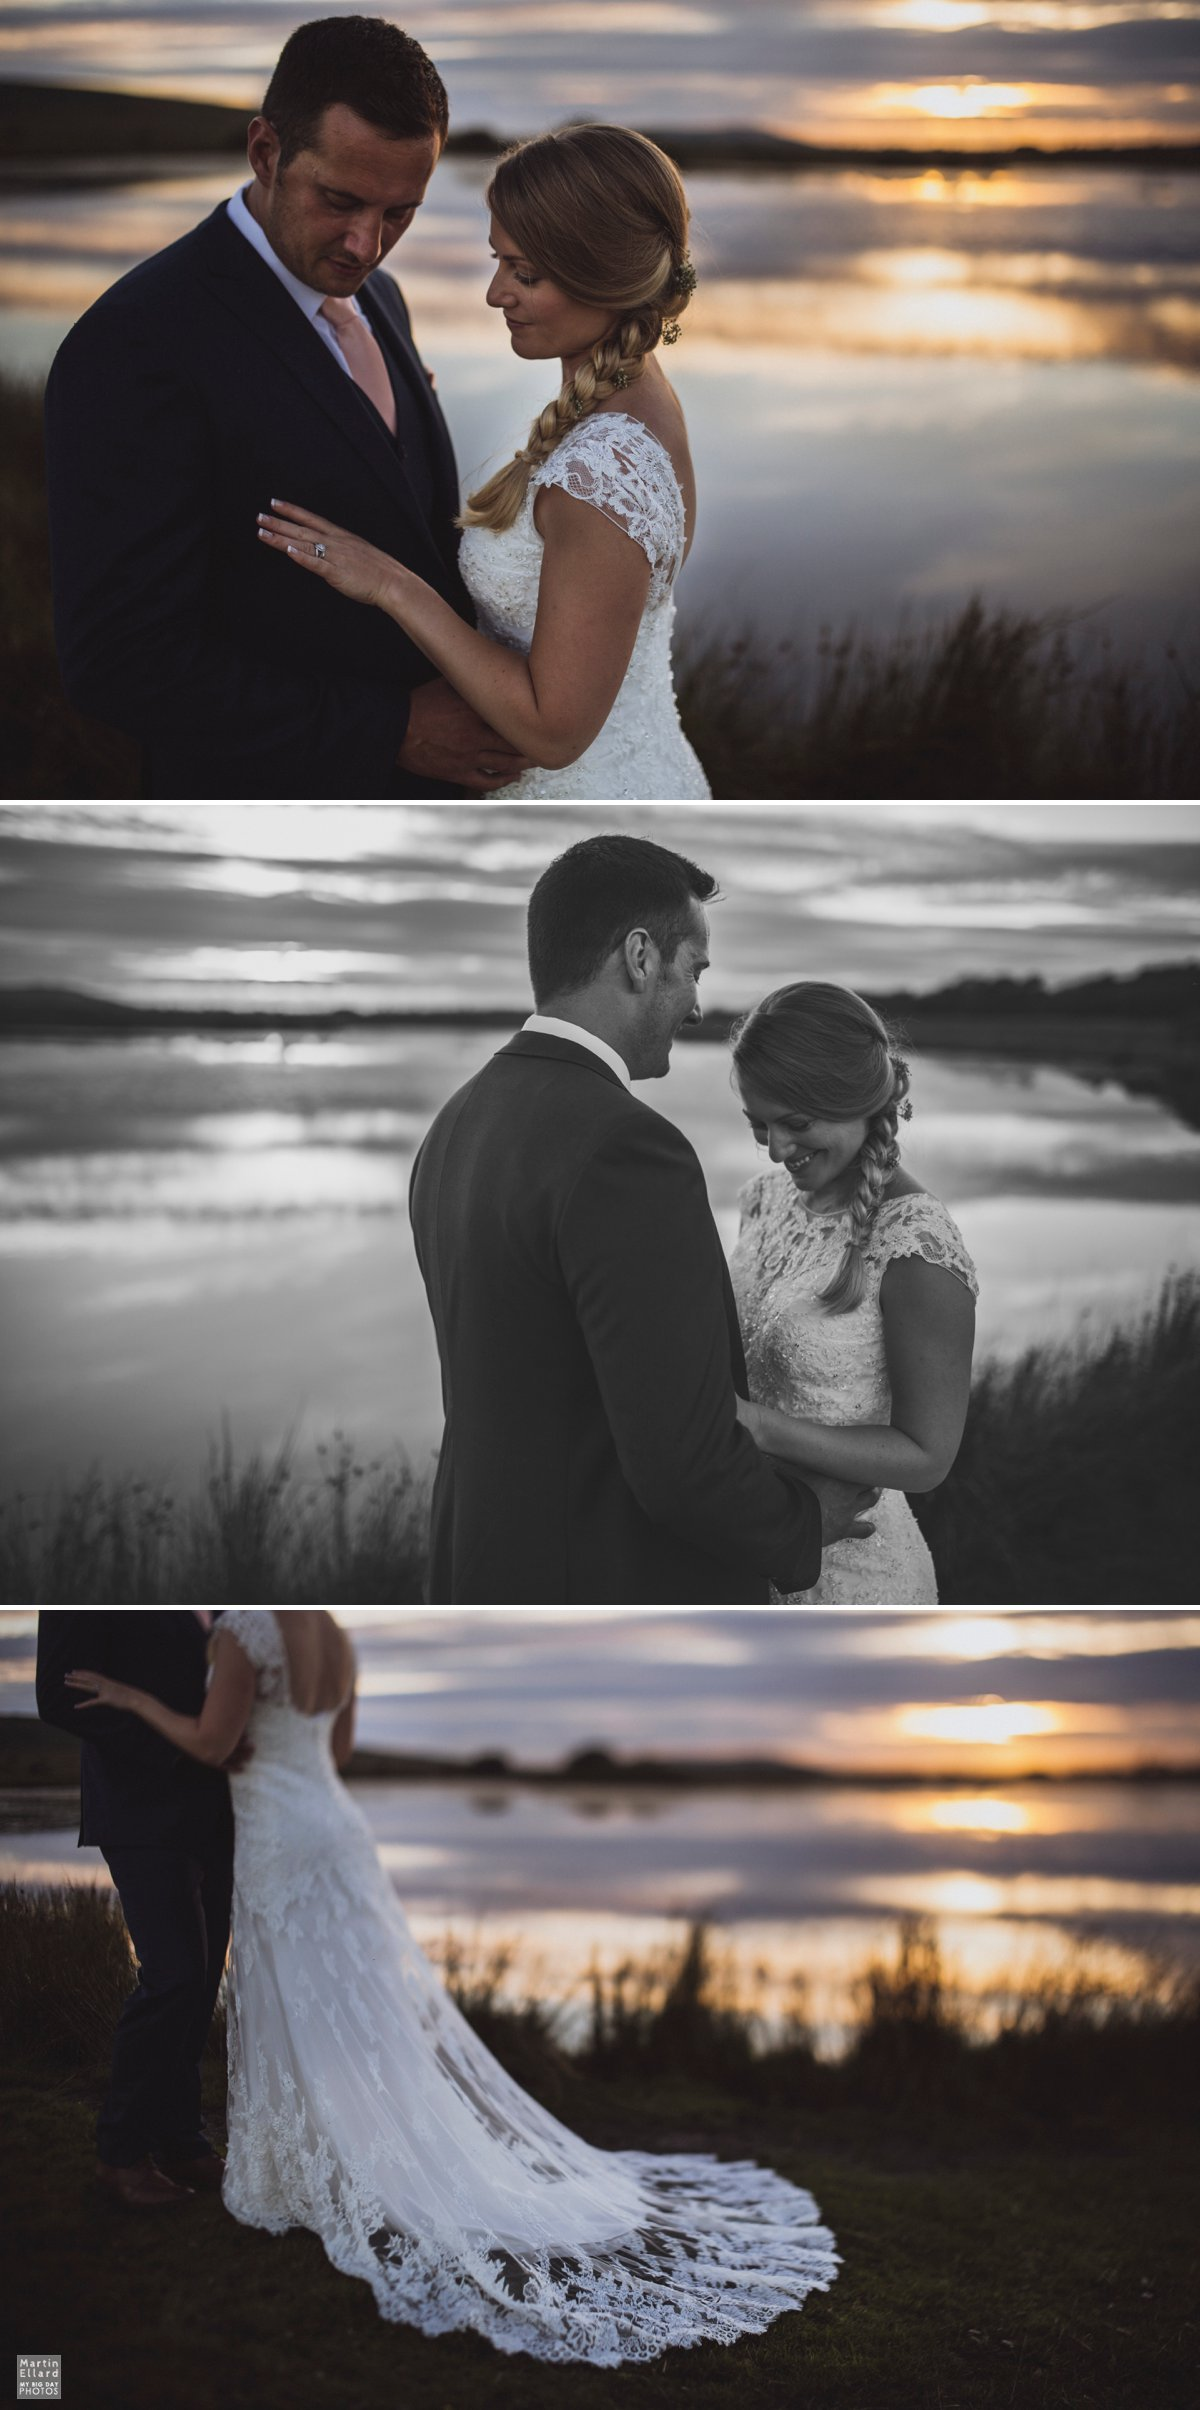 sunset over Gower wedding photograph